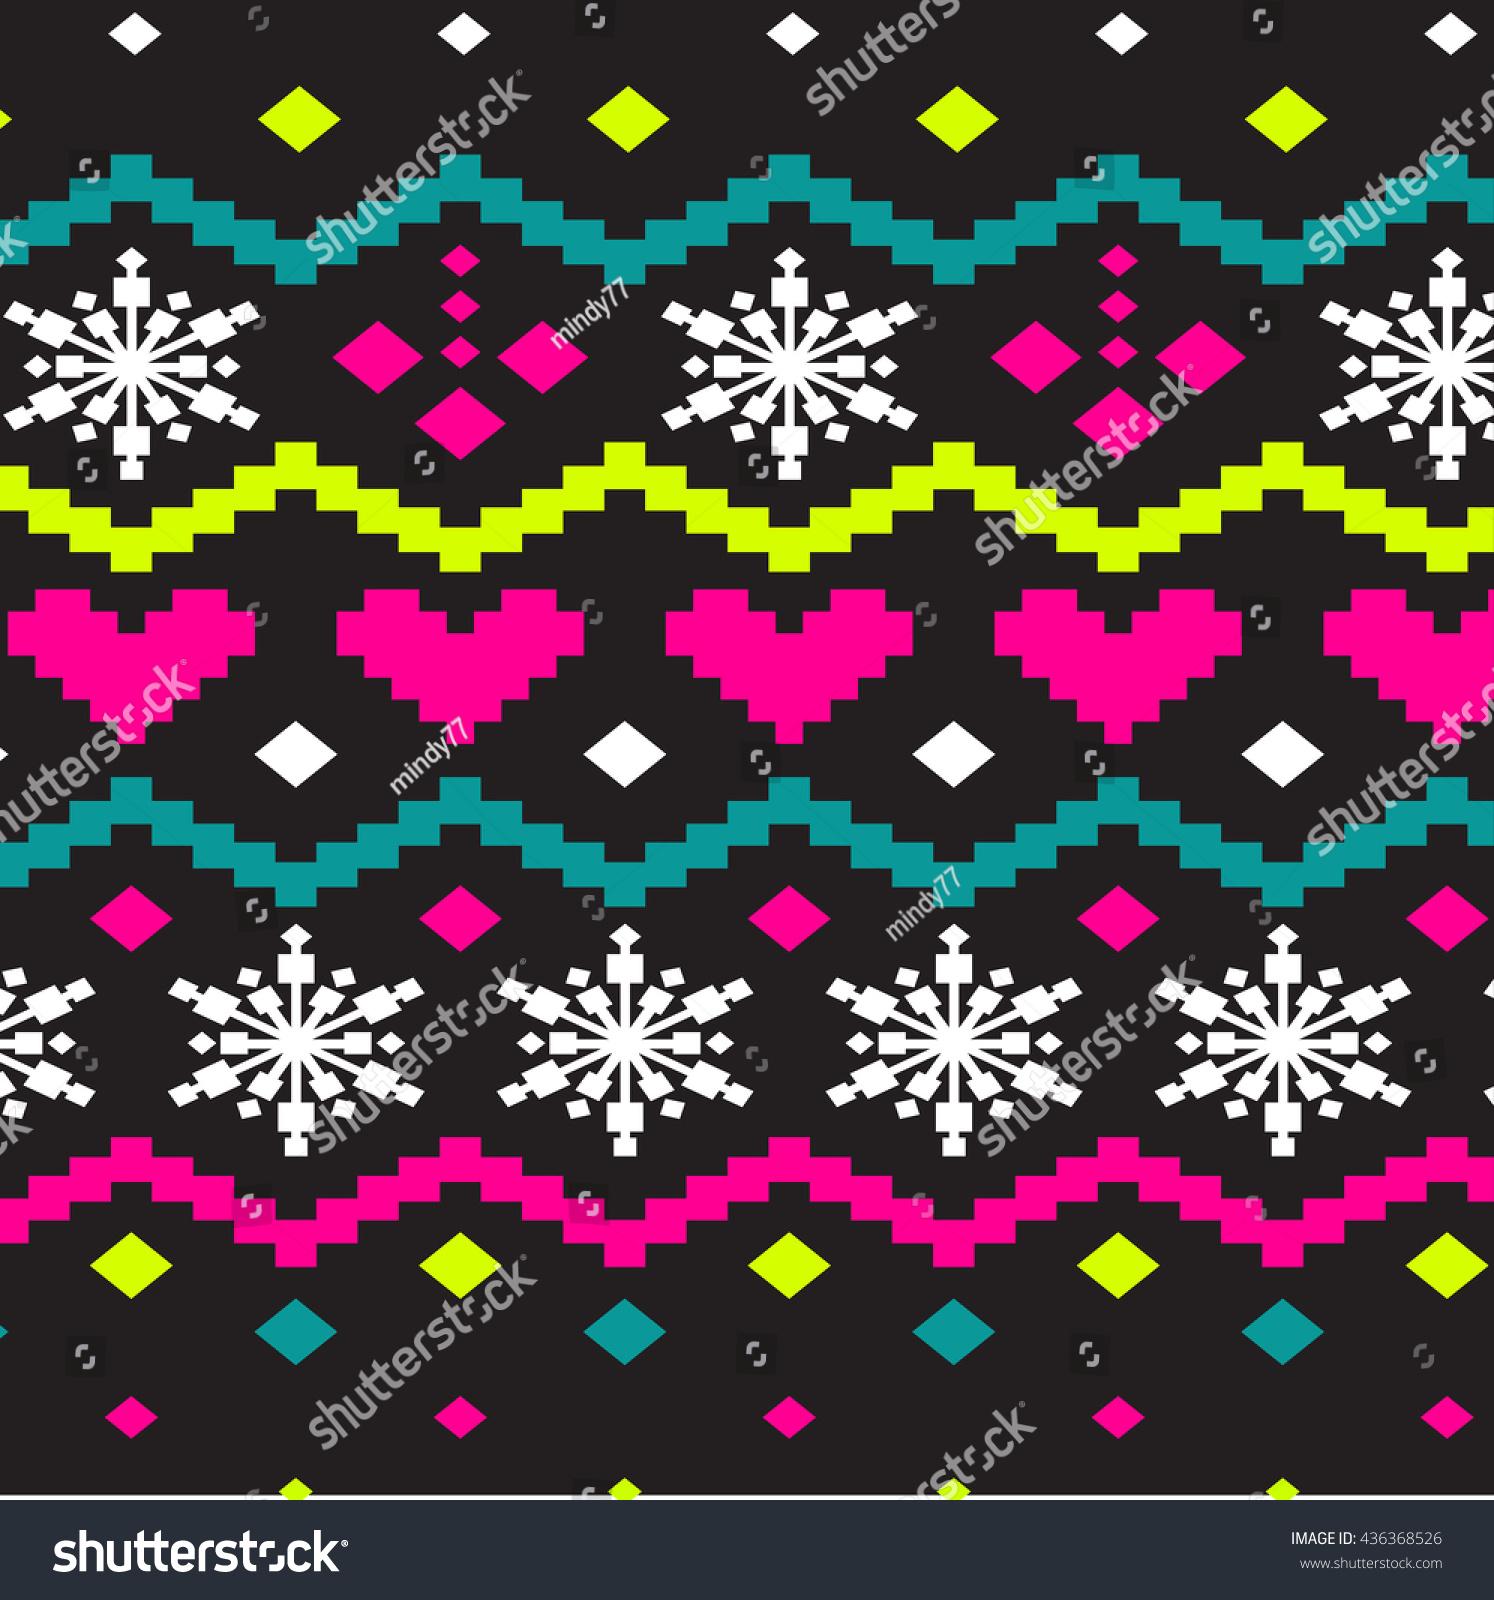 Christmas Sweater Design Seamless Knitting Pattern Stock Vector ...